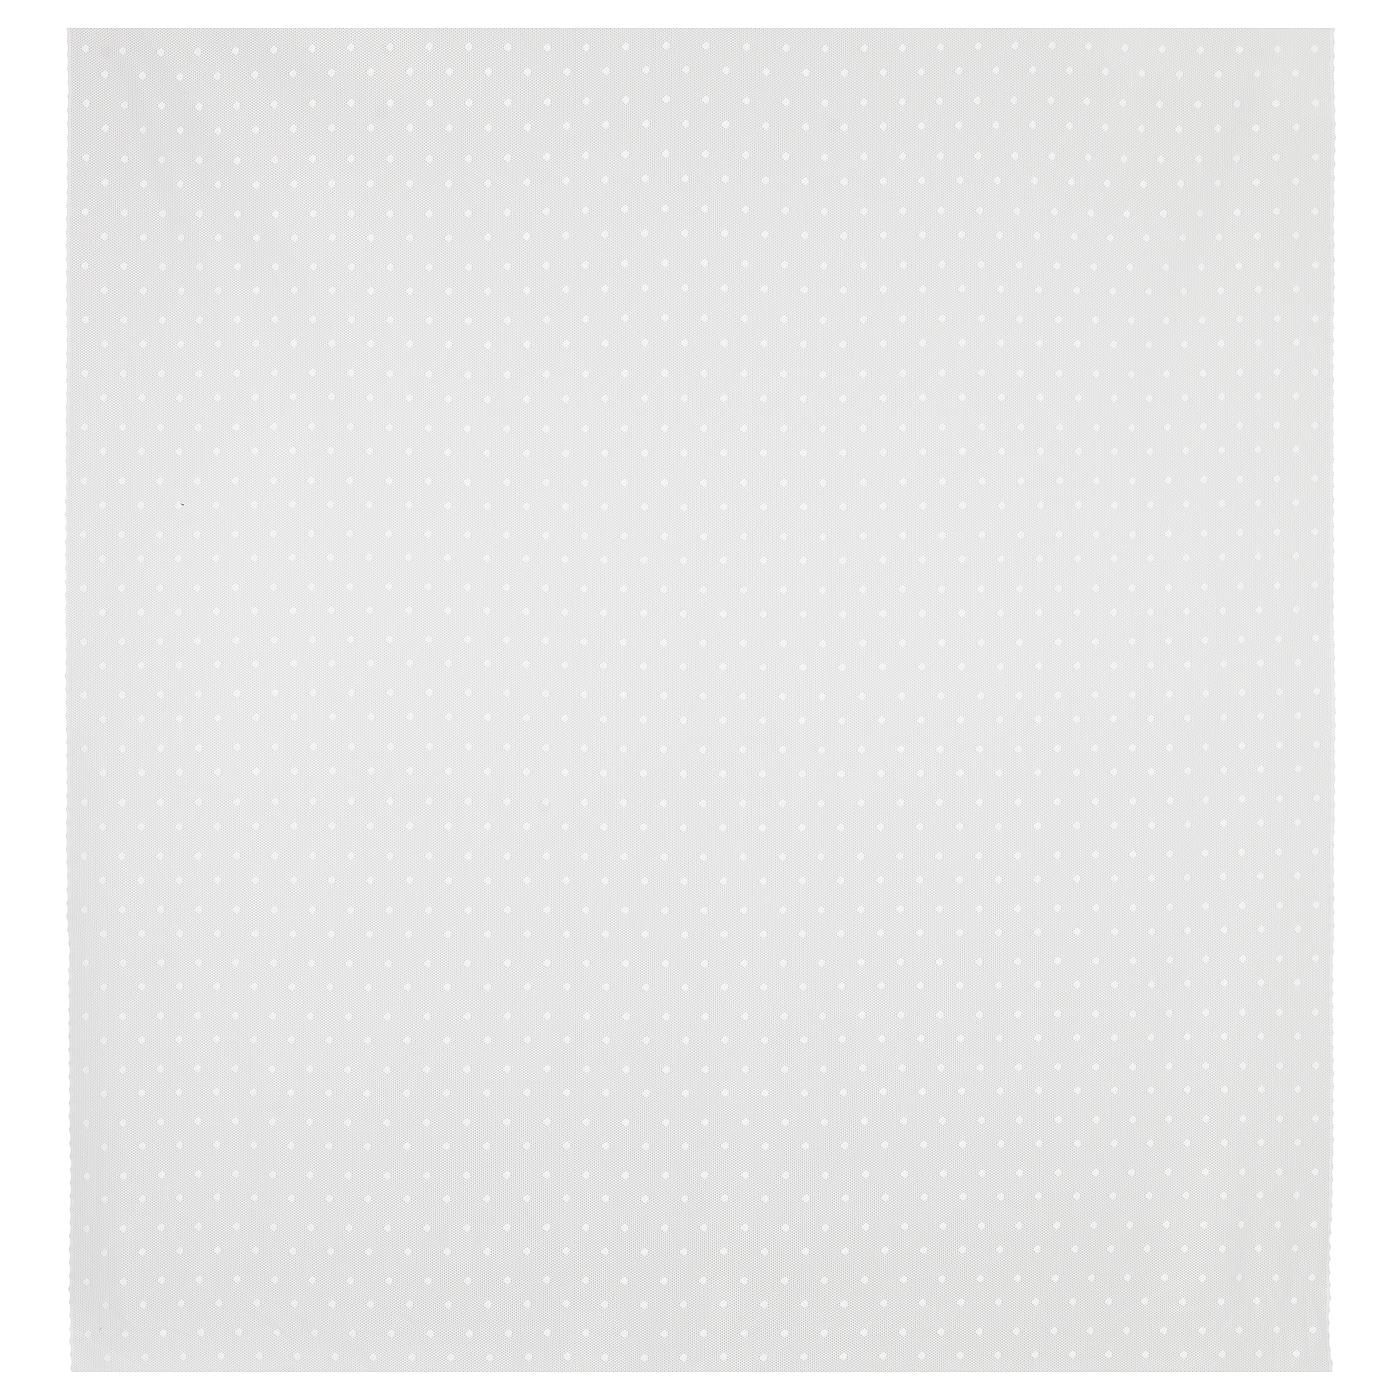 sunrid tissu au m tre blanc 150 cm ikea. Black Bedroom Furniture Sets. Home Design Ideas